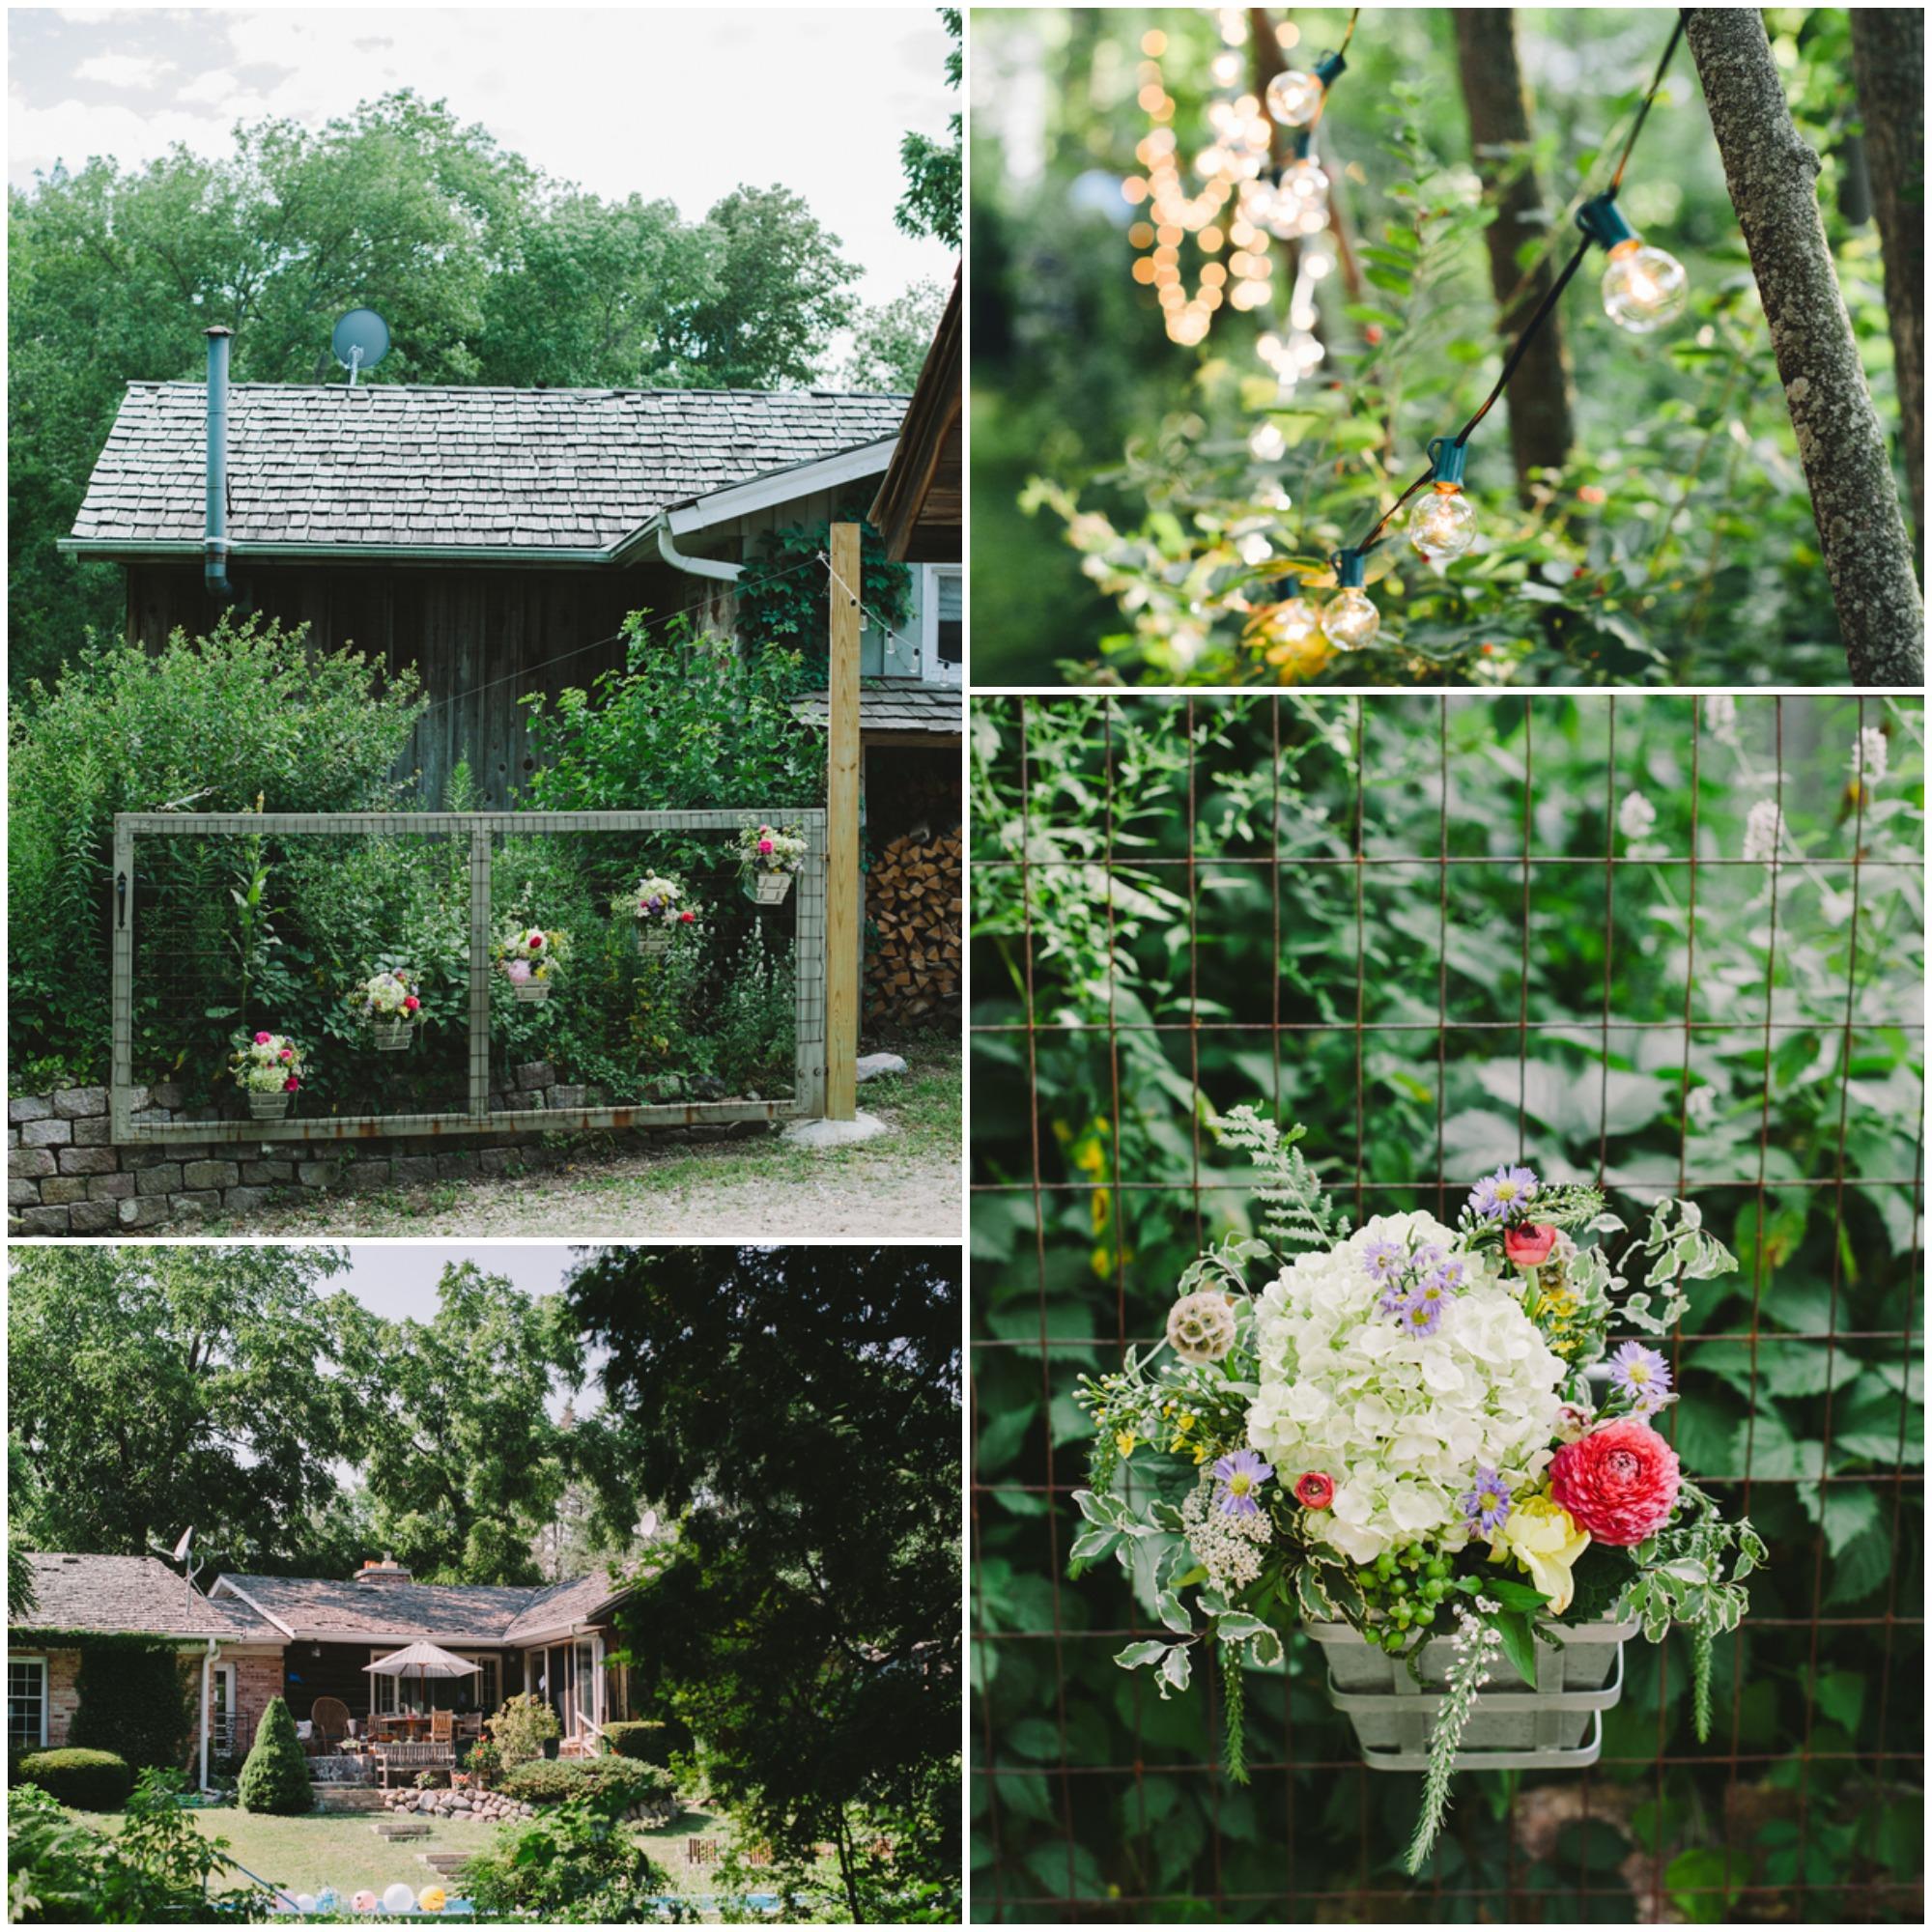 Backyard Country Wedding Ideas: A Vintage Style Backyard Wedding